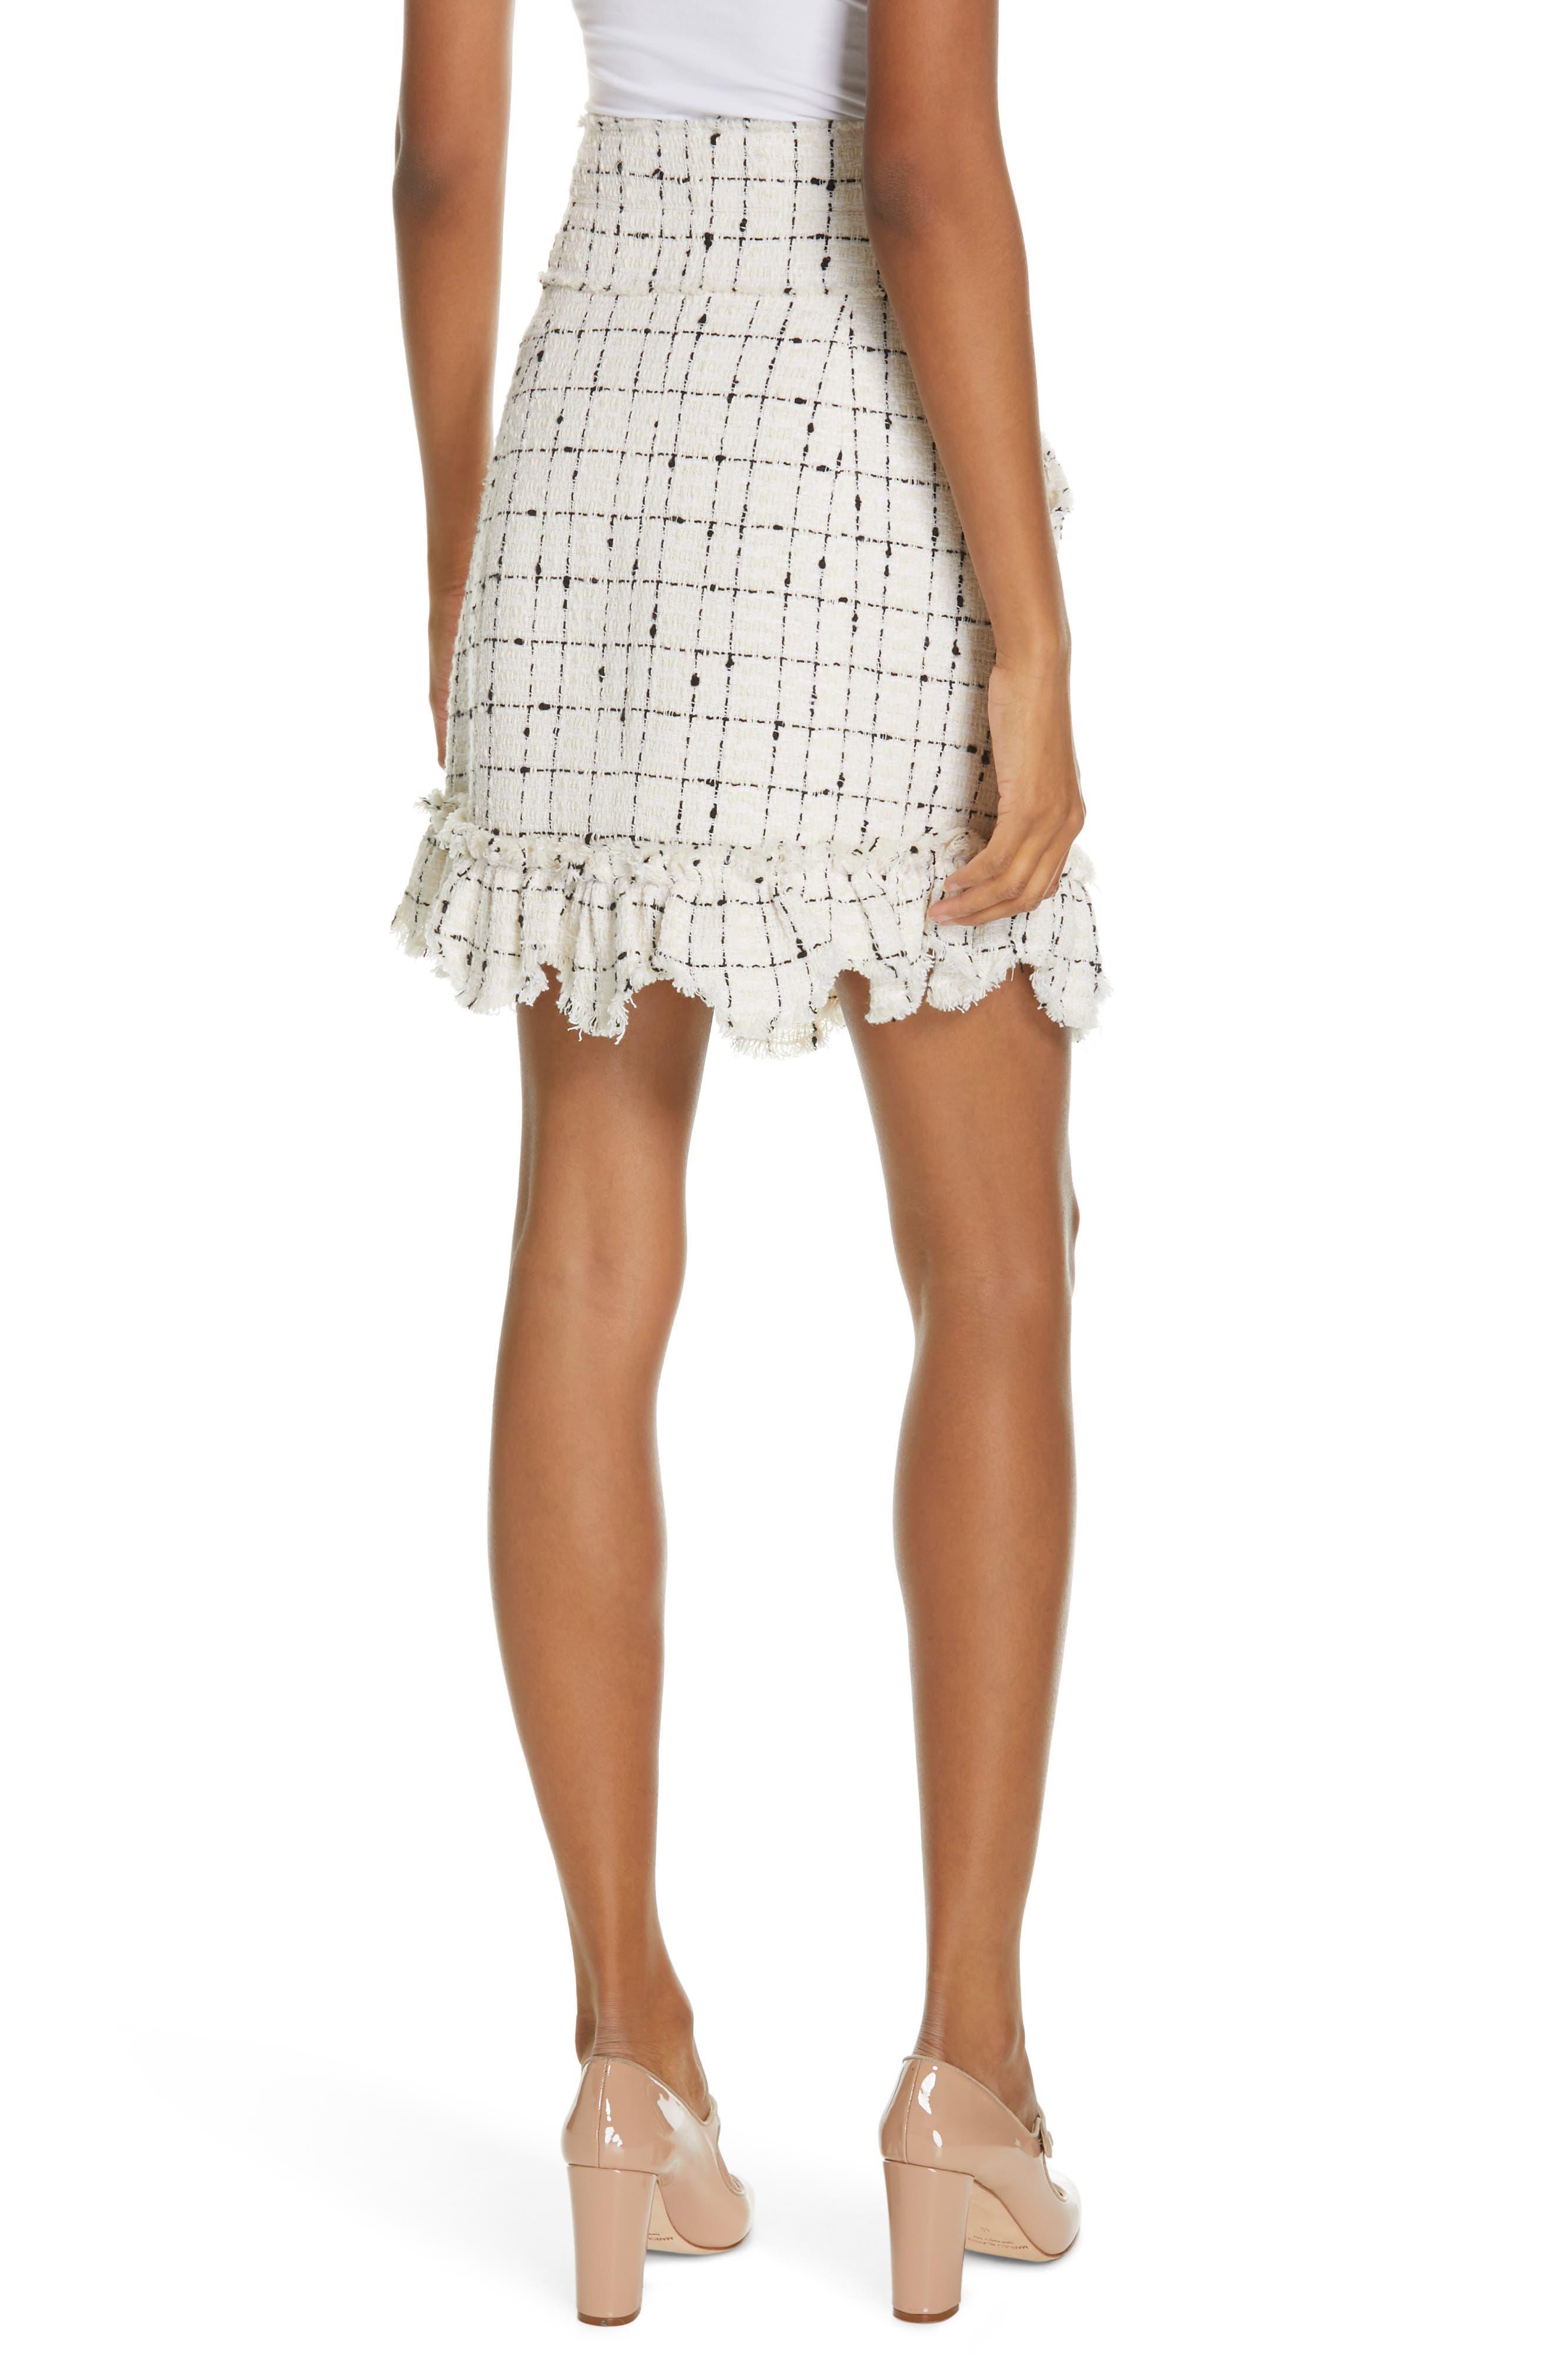 REBECCA TAYLOR, Scallop Hem Tweed Skirt, Alternate thumbnail 2, color, CREAM COMBO